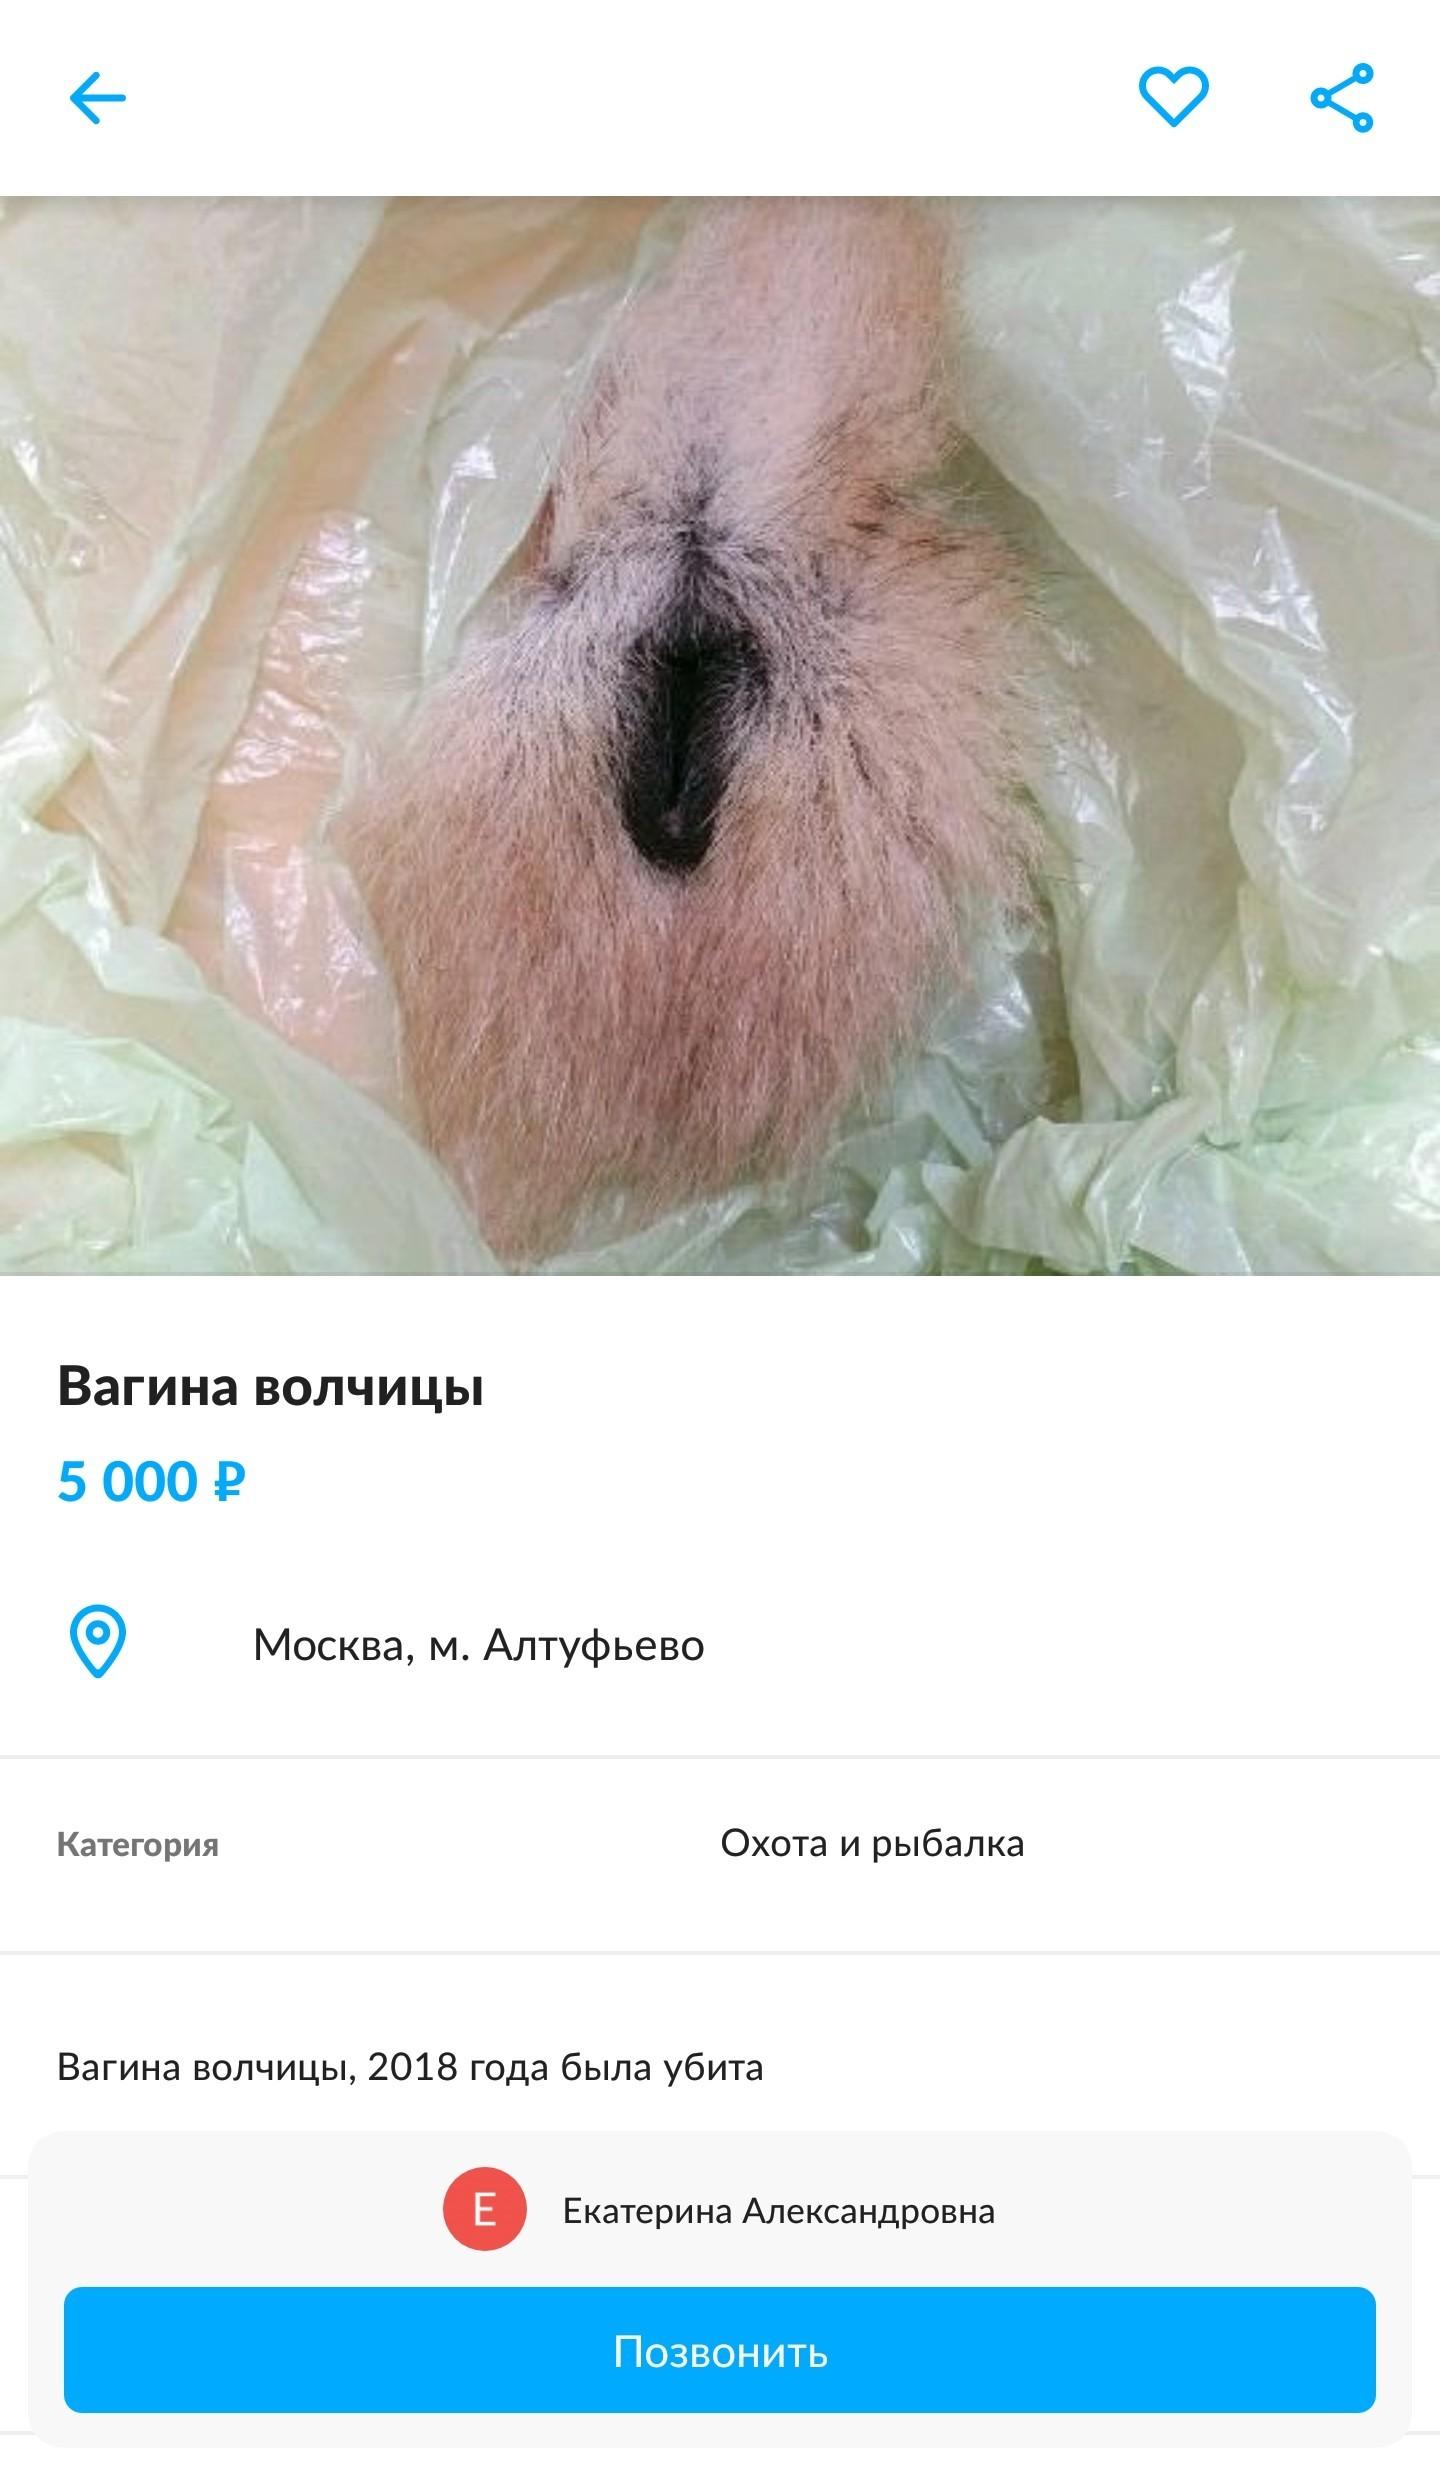 foto-gde-vagina-chastnoe-foto-goloy-tolstushki-zheni